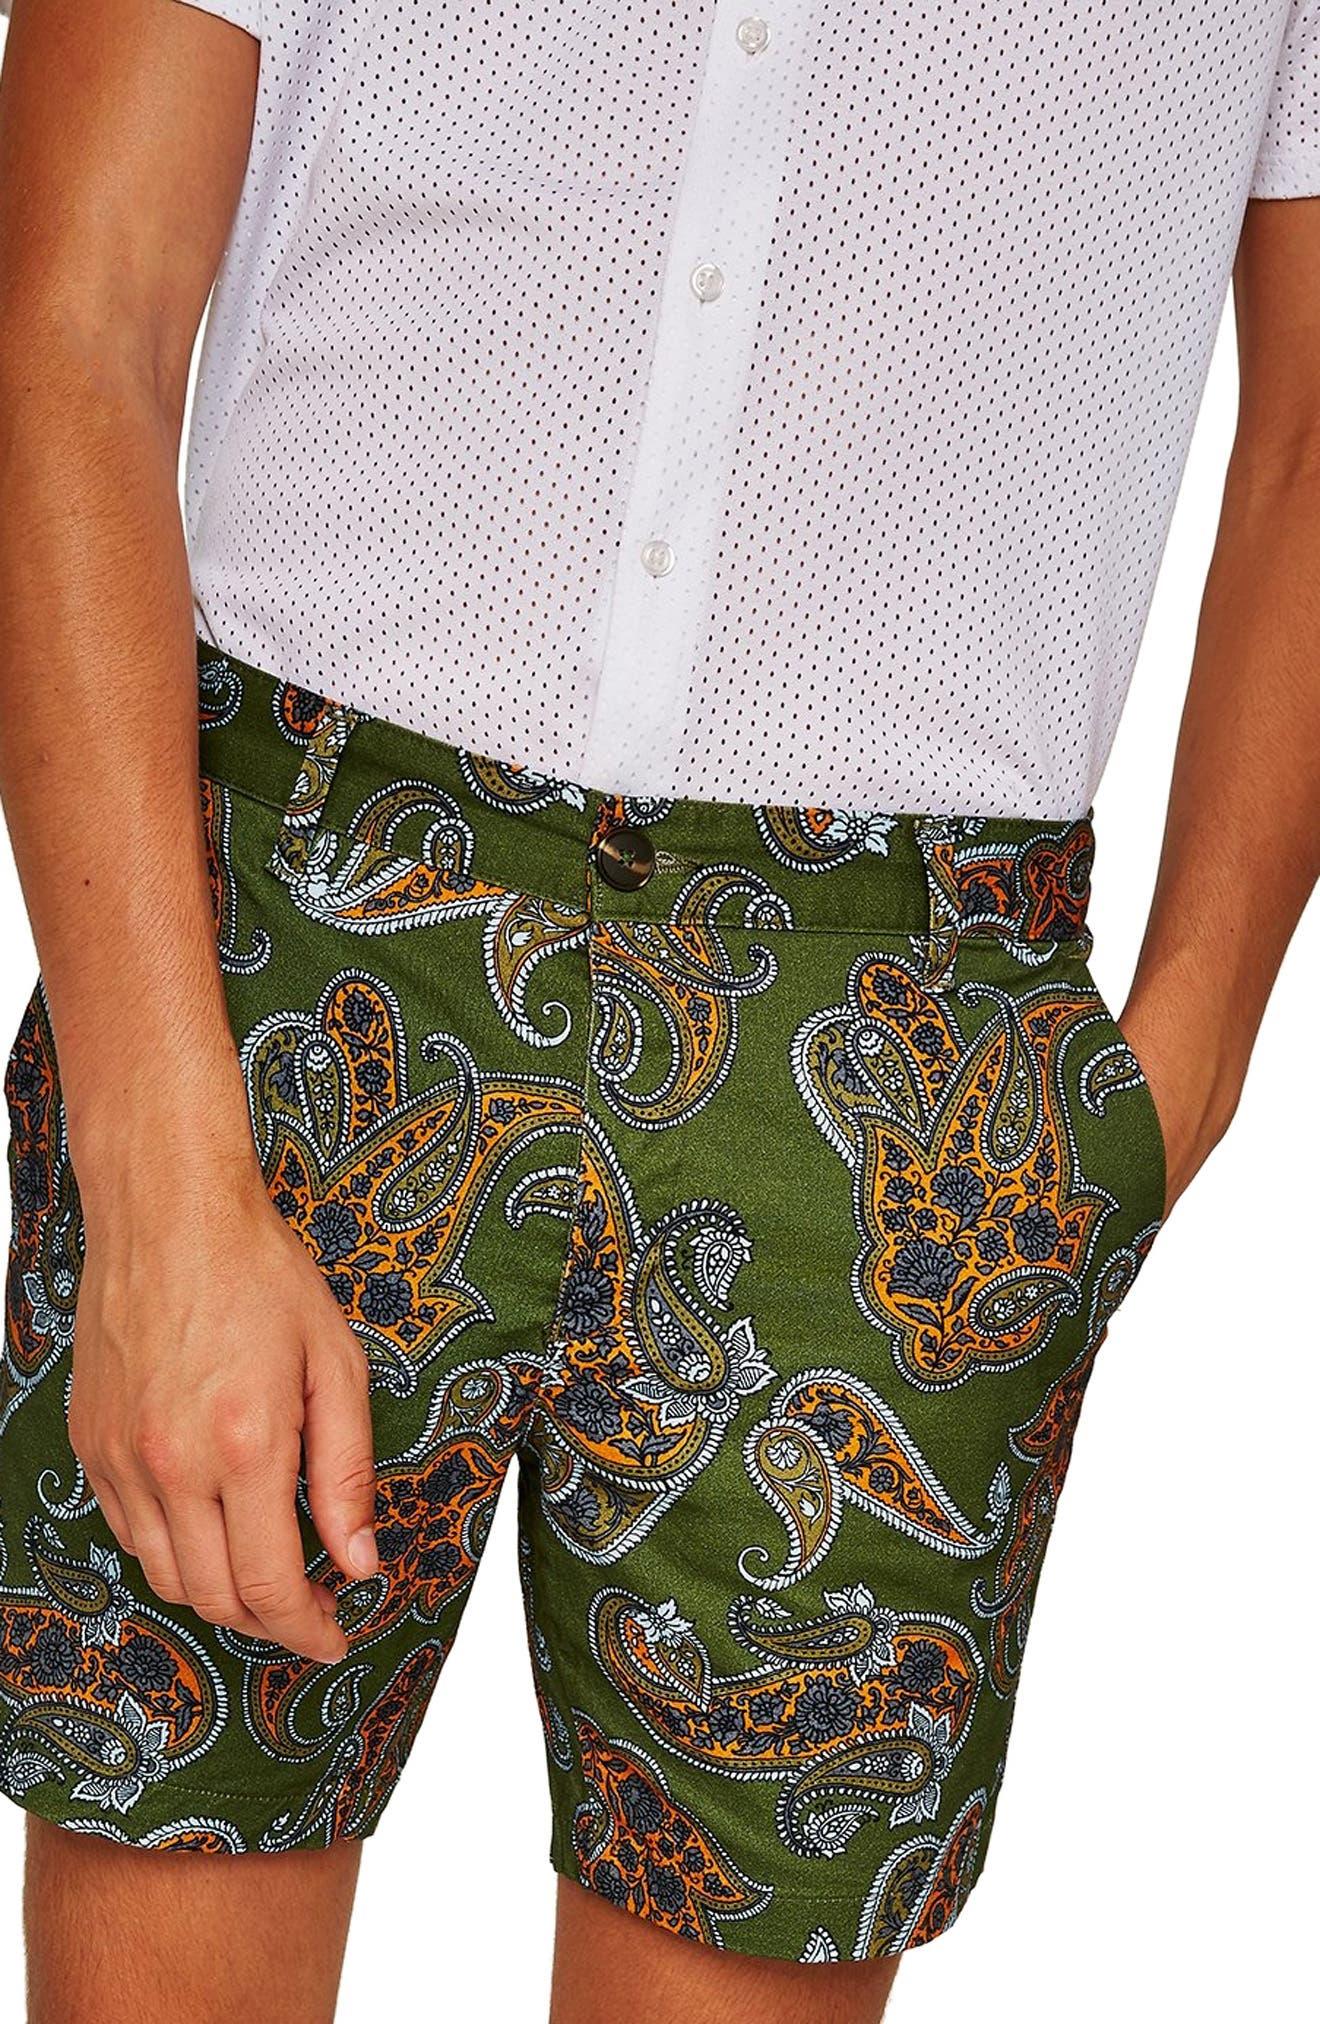 Slim Fir Paisley Print Shorts,                             Alternate thumbnail 3, color,                             DARK BLUE